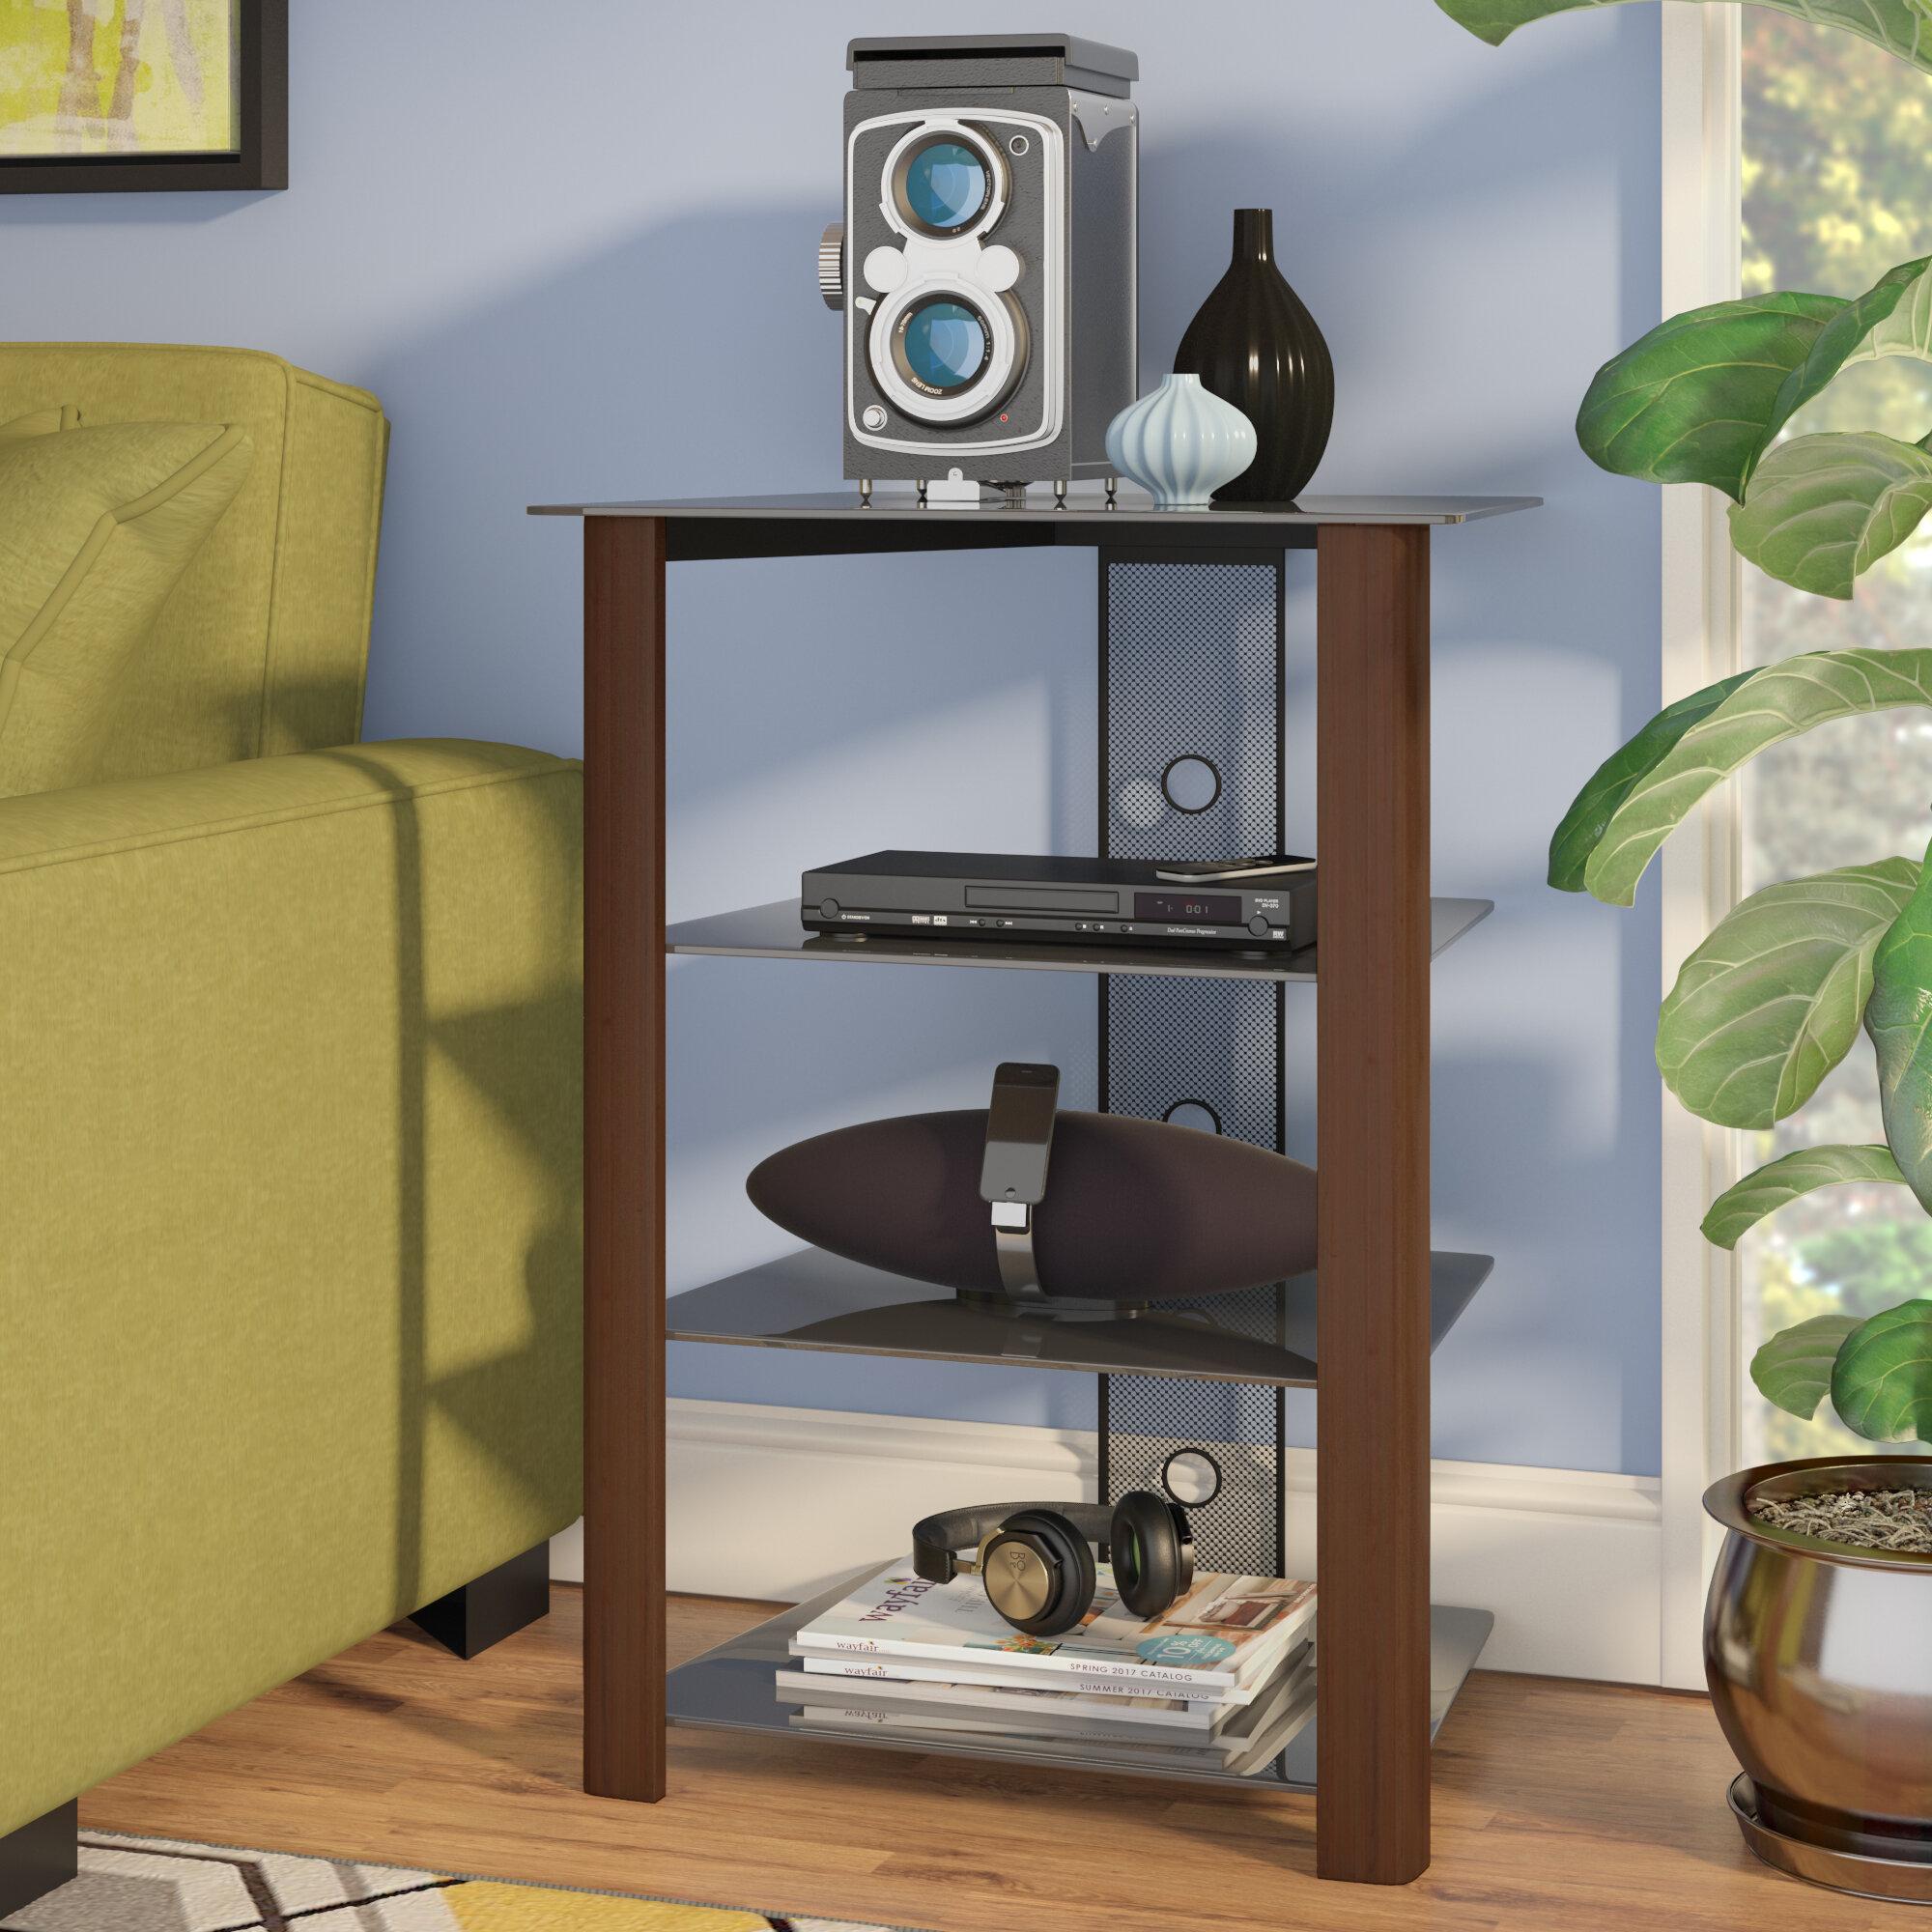 audio shock reg skb mount c case rolling roto deep racks product rack